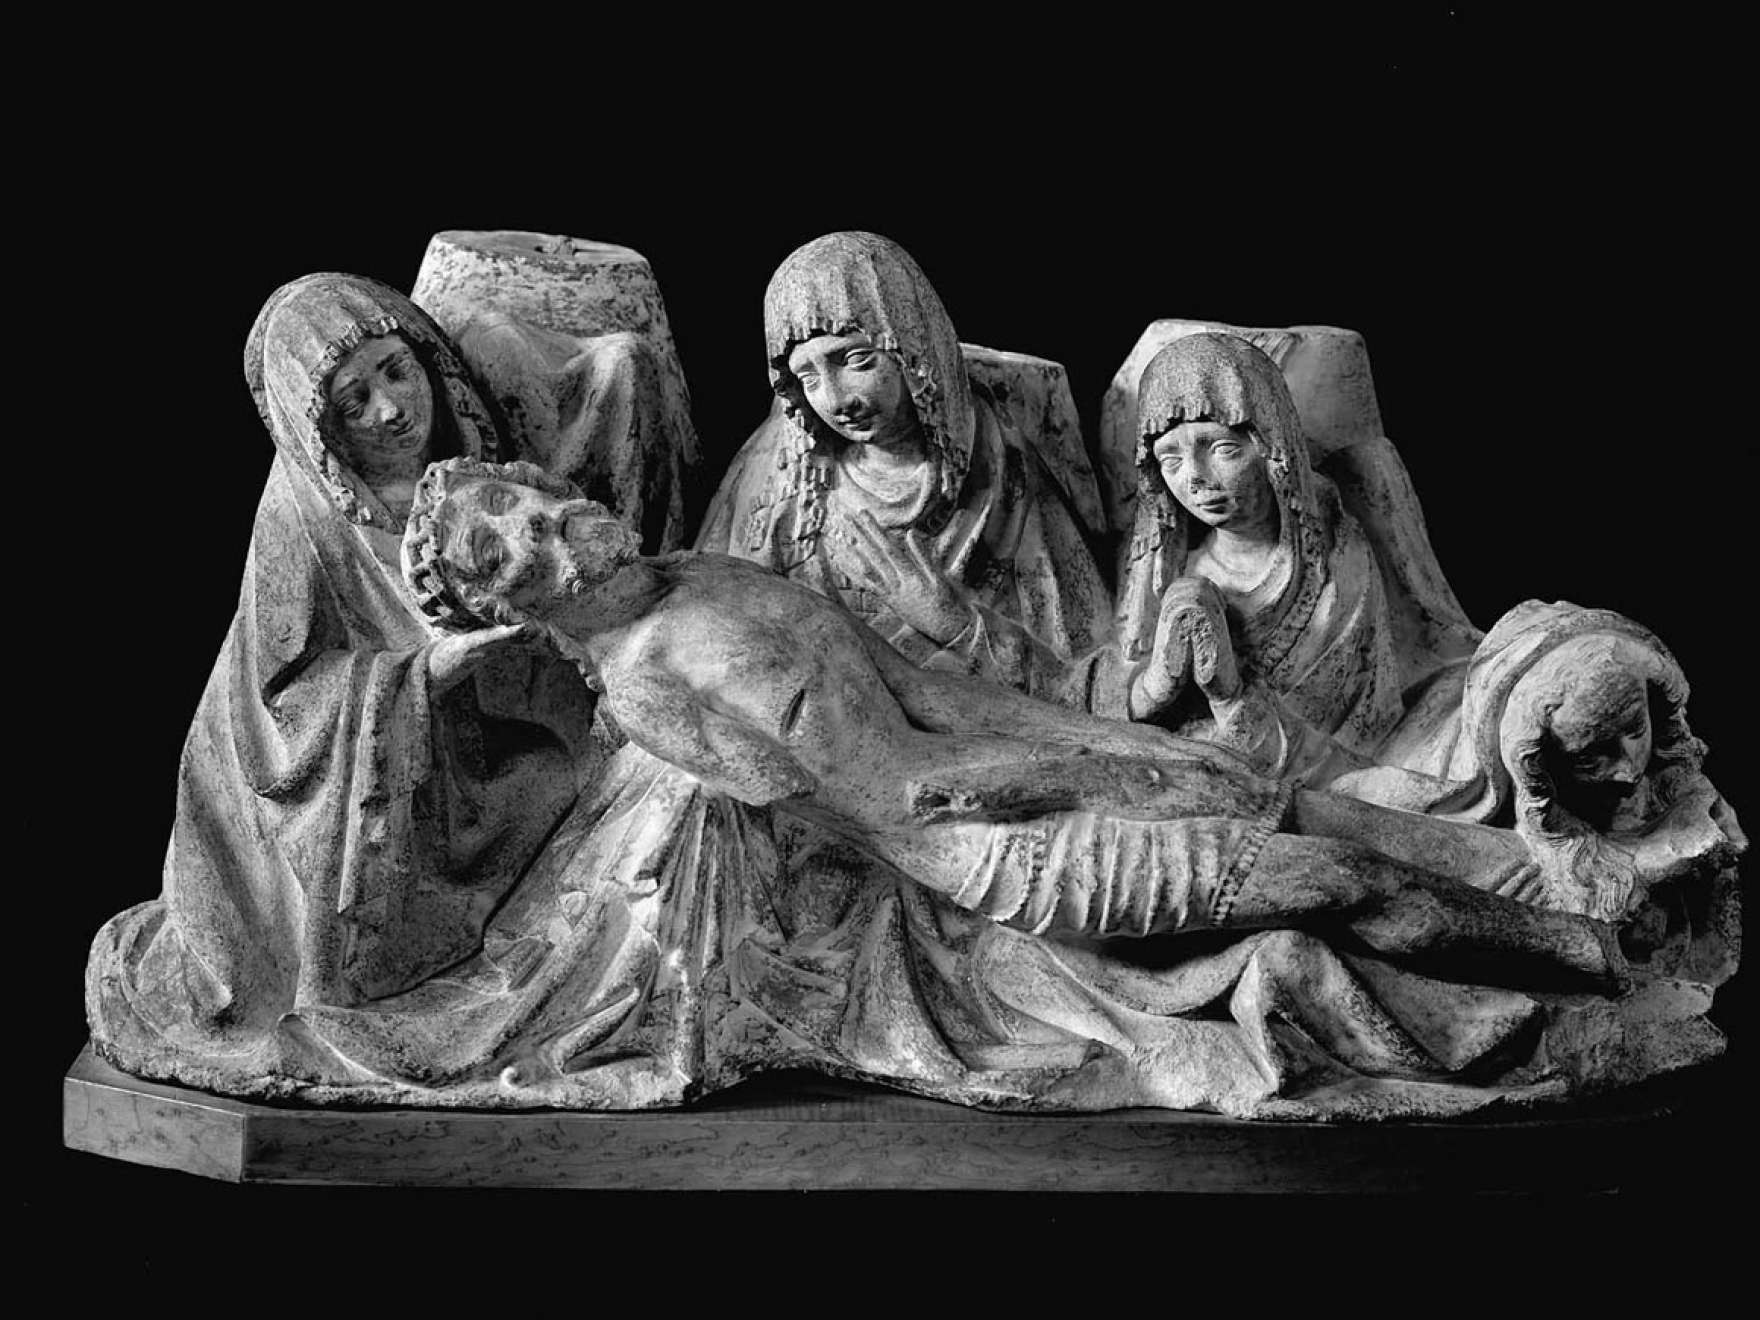 Lamentation sculpture